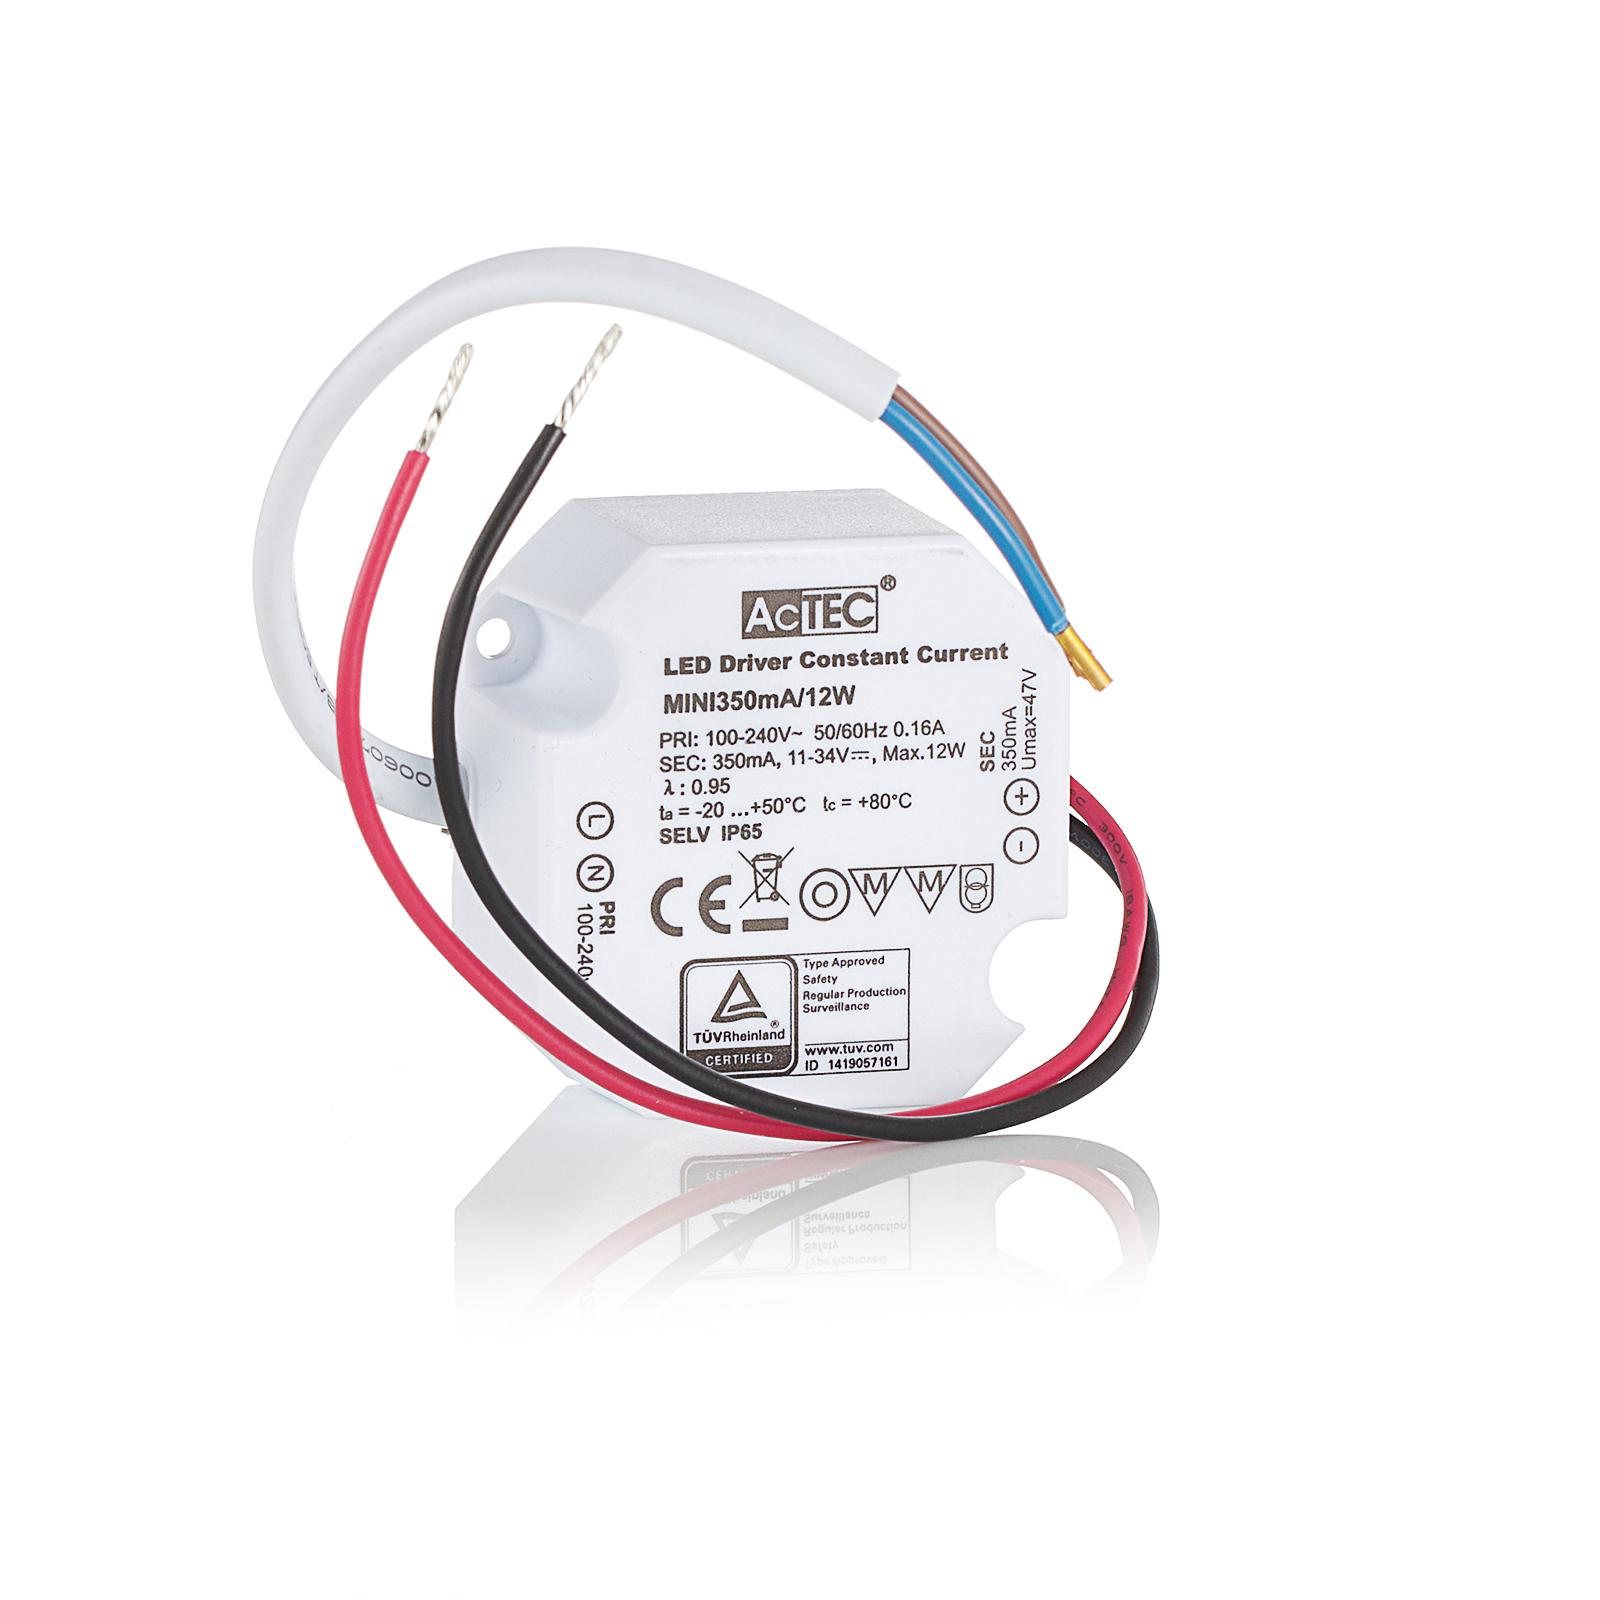 AcTEC Mini LED-Treiber CC 350mA, 12W, IP65